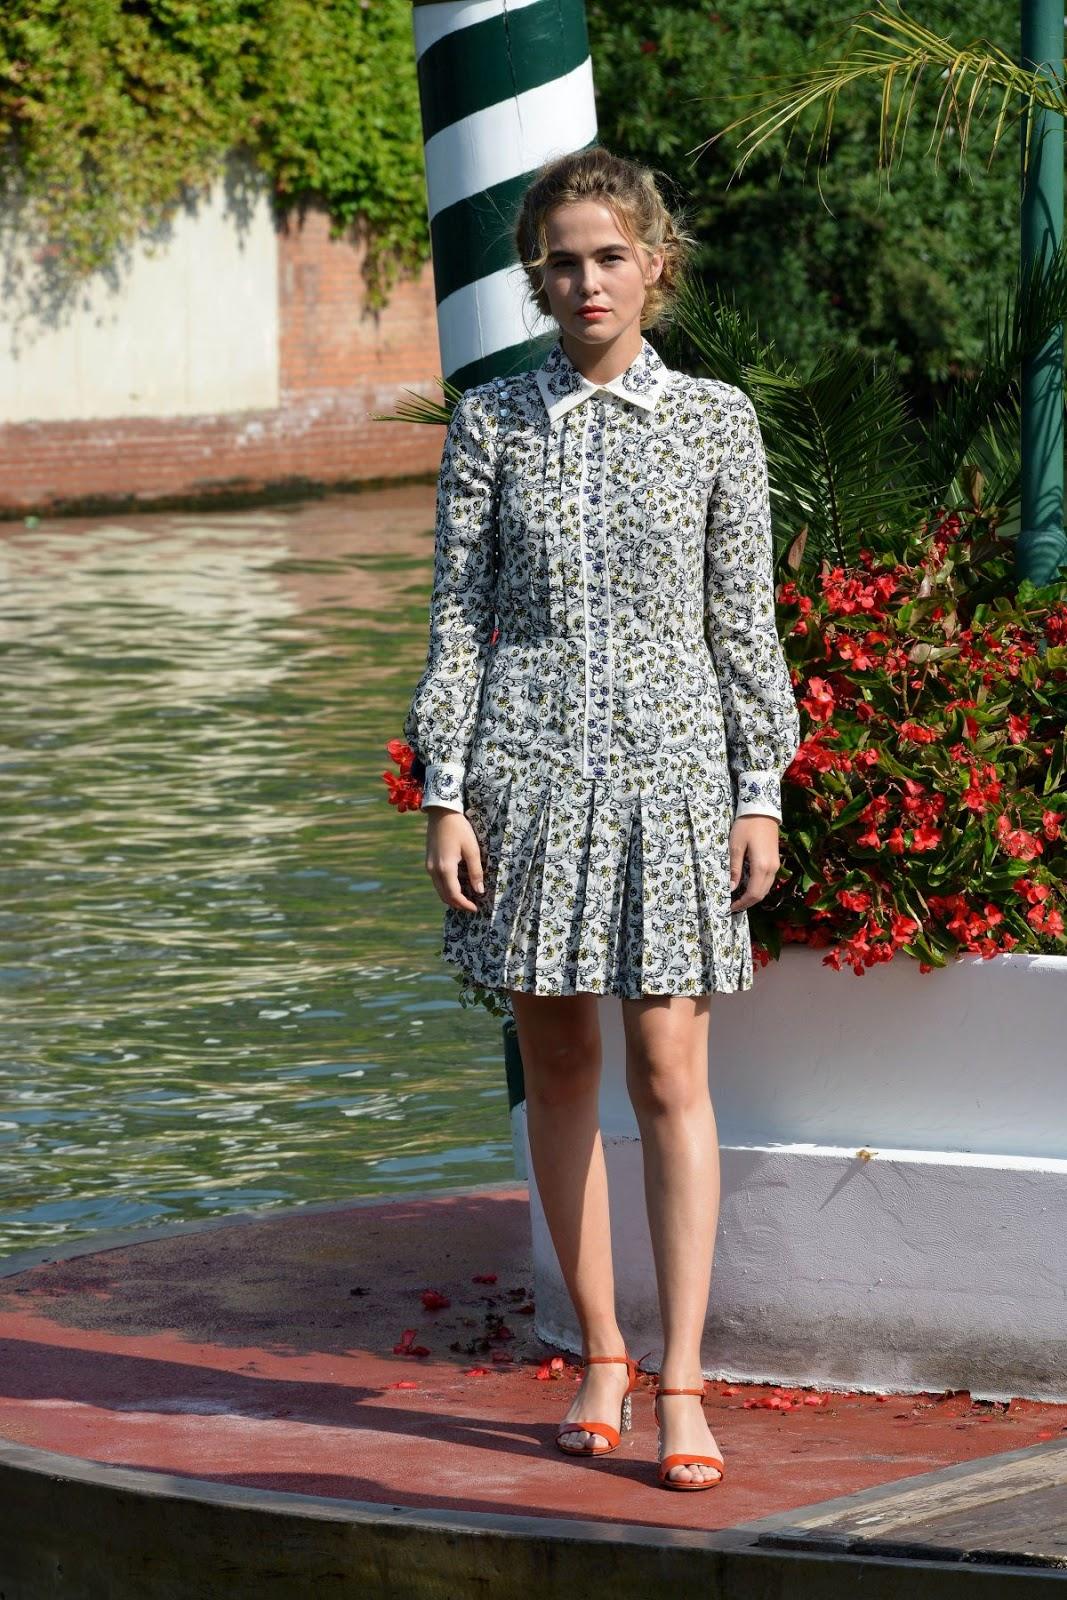 Zoey Deutch at 73rd Venice Film Festival, Italy